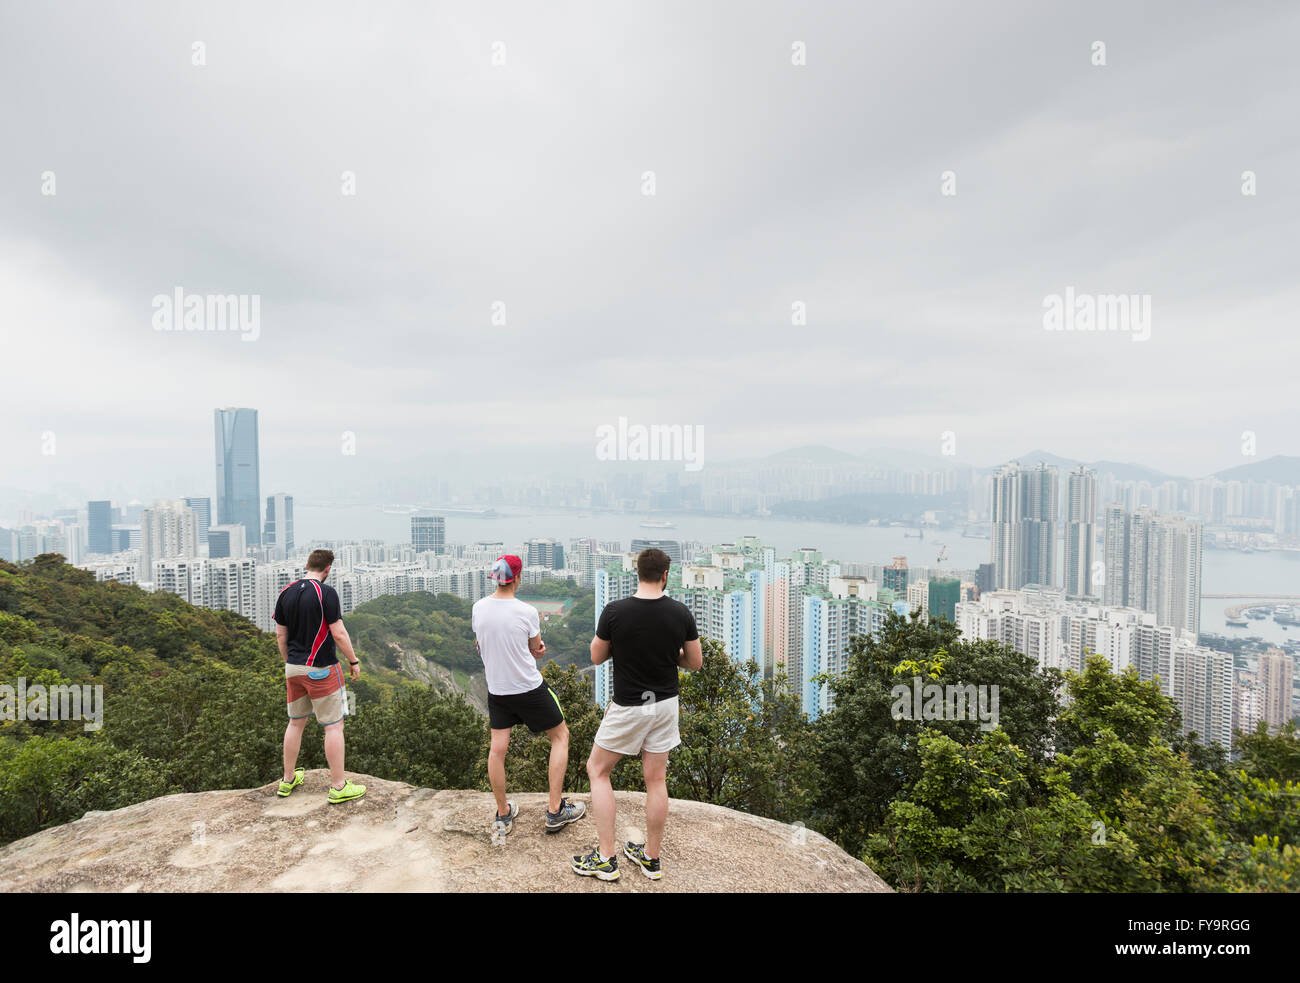 View Looking Out Towards East Side Of Hong Kong Island Sai Wan Ho Stock Photo Royalty Free